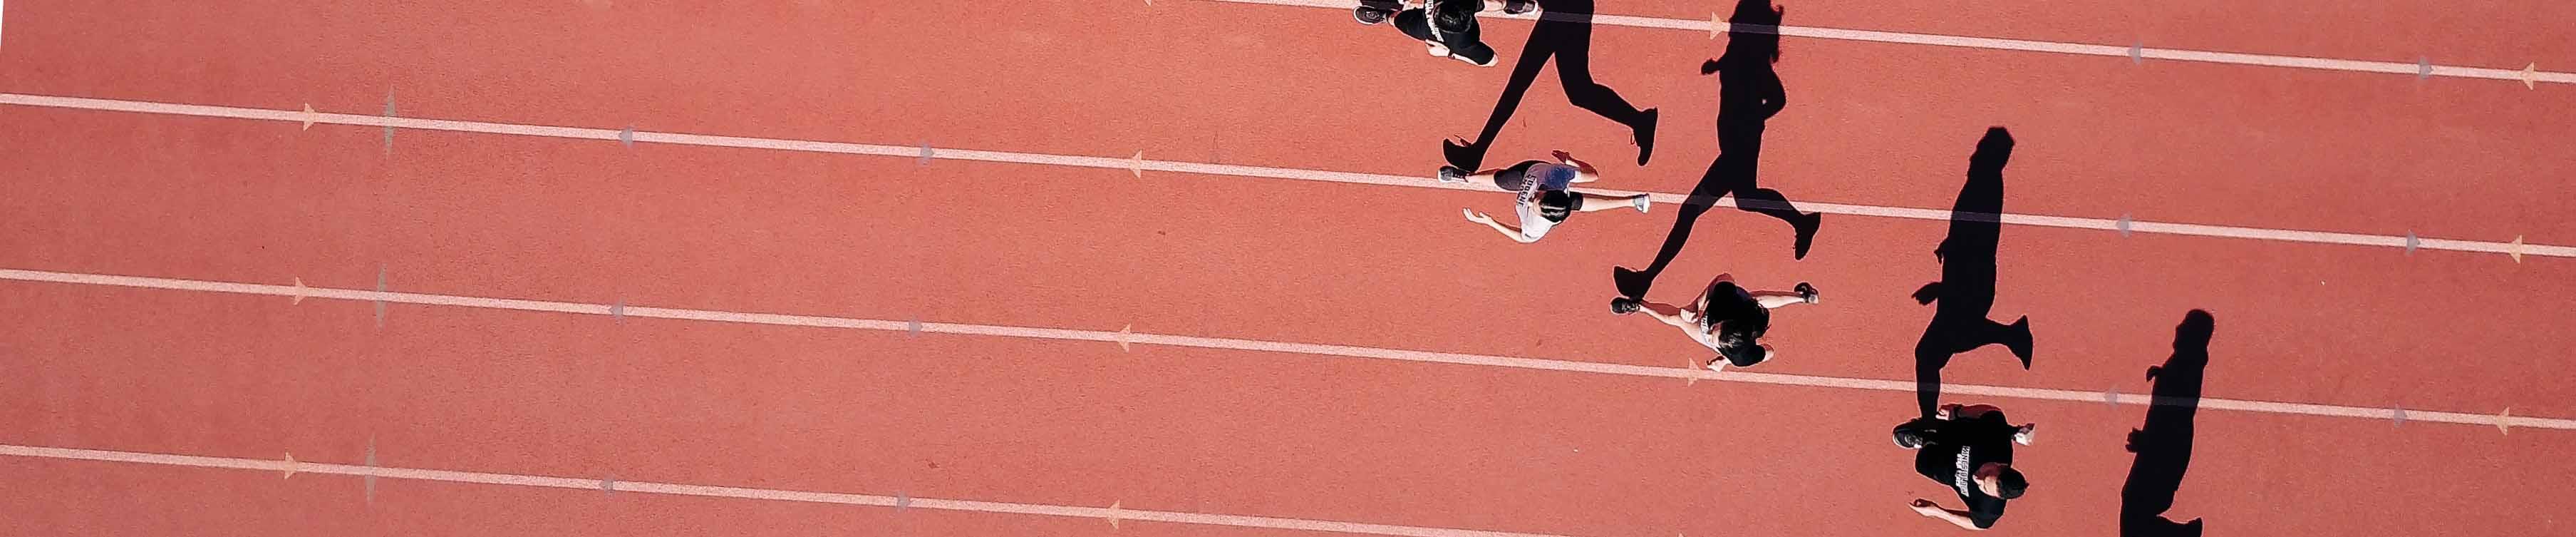 Jak biegać, żeby schudnąć - Anna Lewandowska - healthy plan by Ann